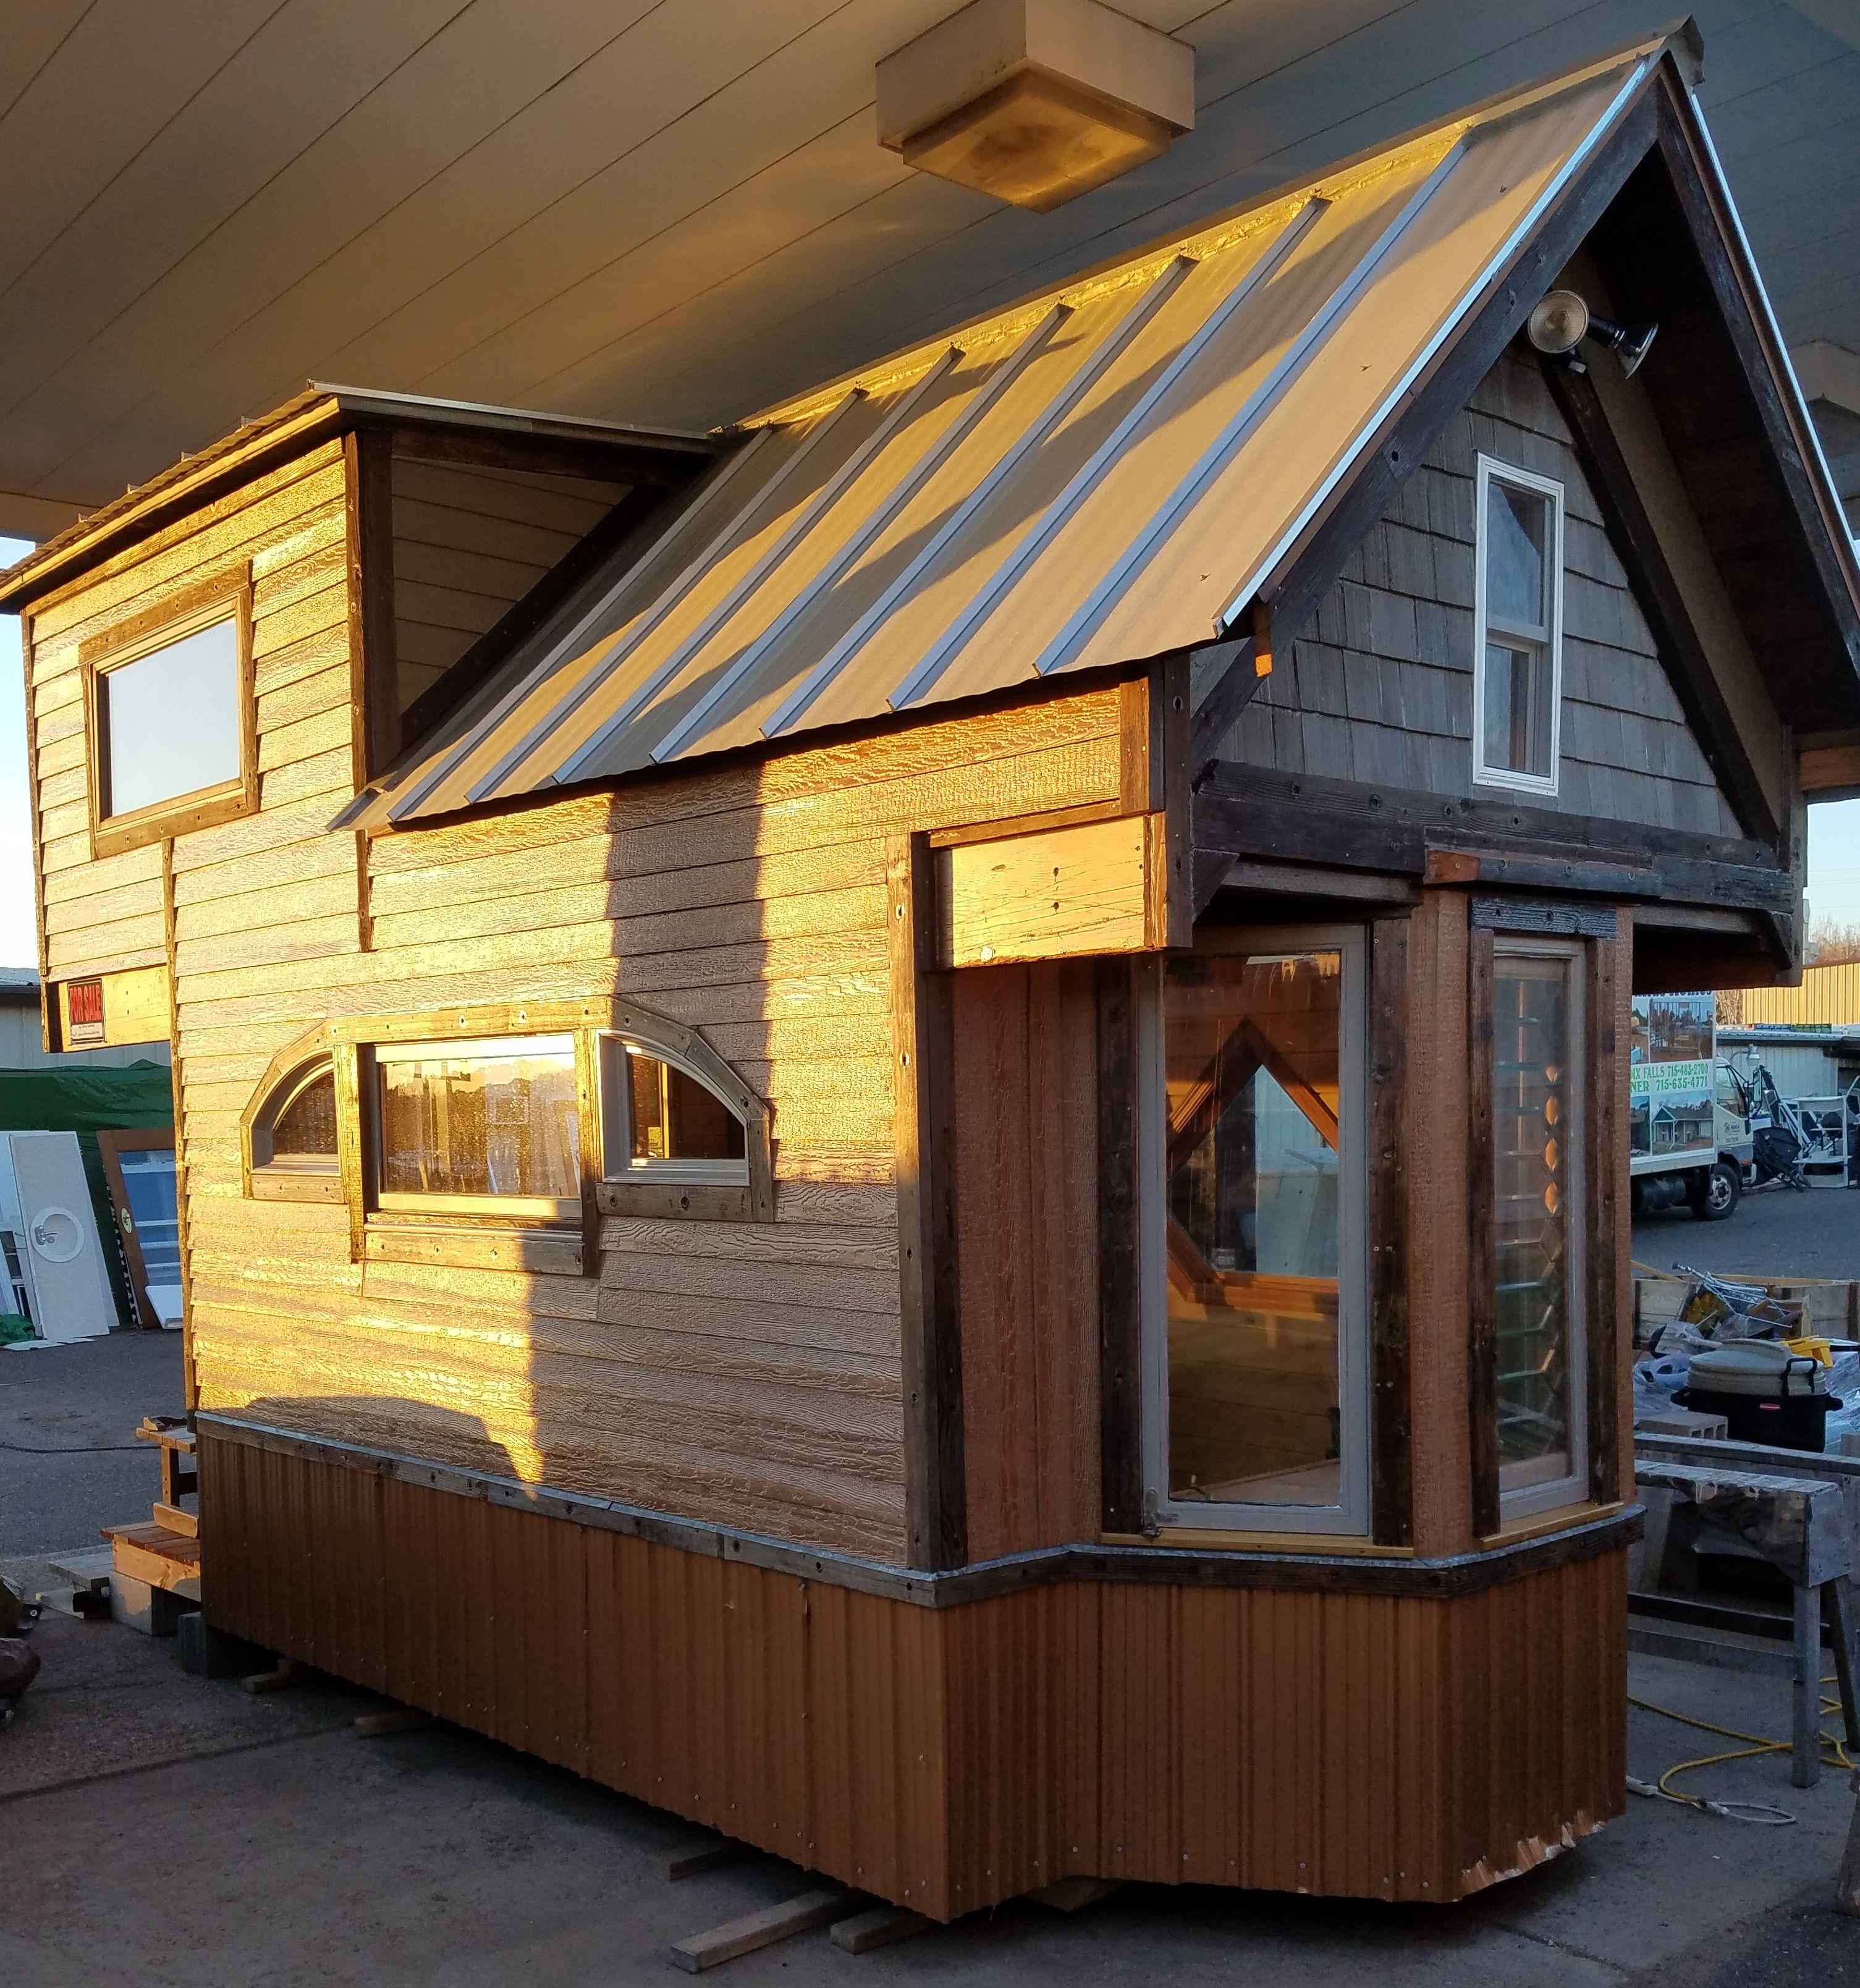 Wild River Retreat Playhouse Studio Cabin Tiny House For